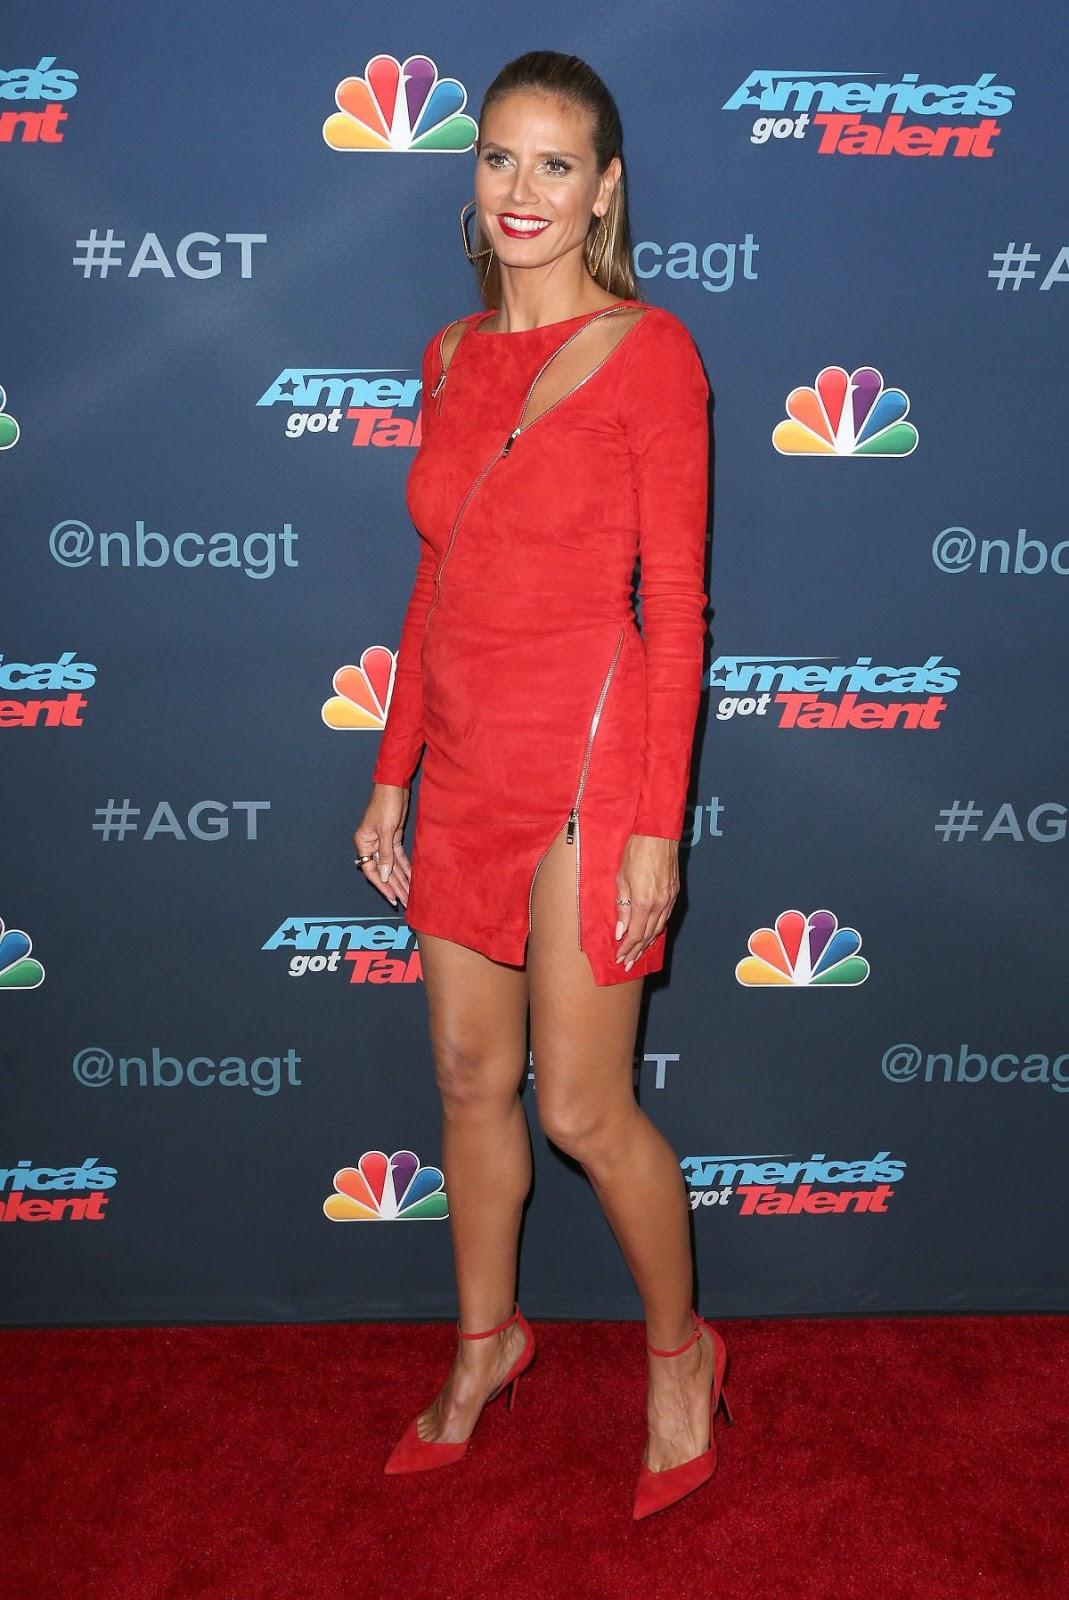 HD Photos of Heidi Klum at America's Got Talent Season 11 Llive Show in Hollywood